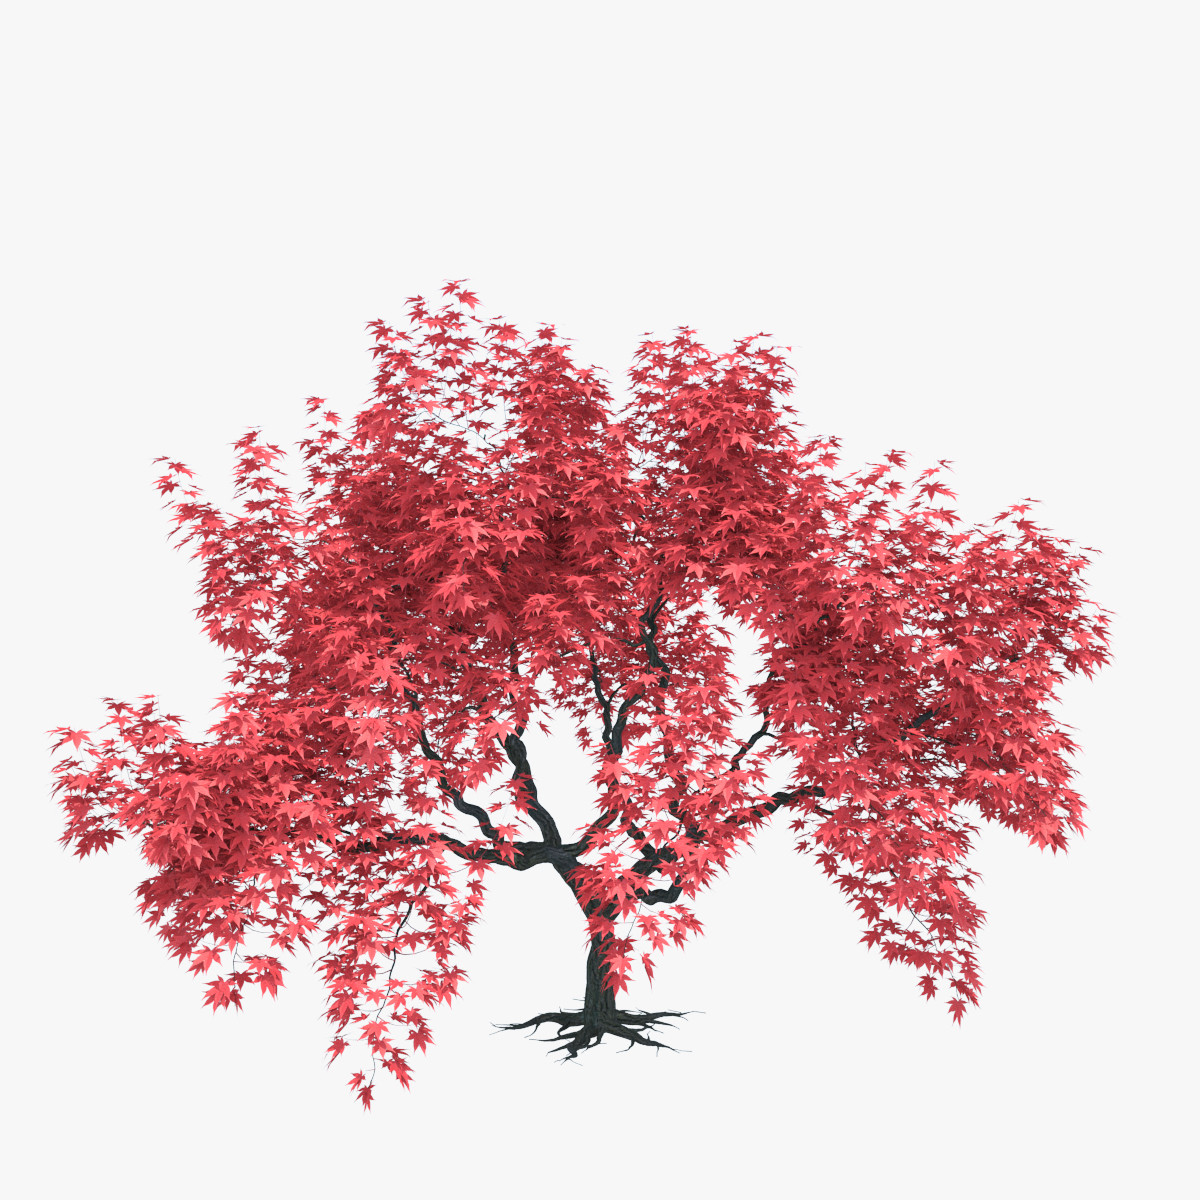 Searched 3d models for Japanese maple leaf (Acer palmatum).